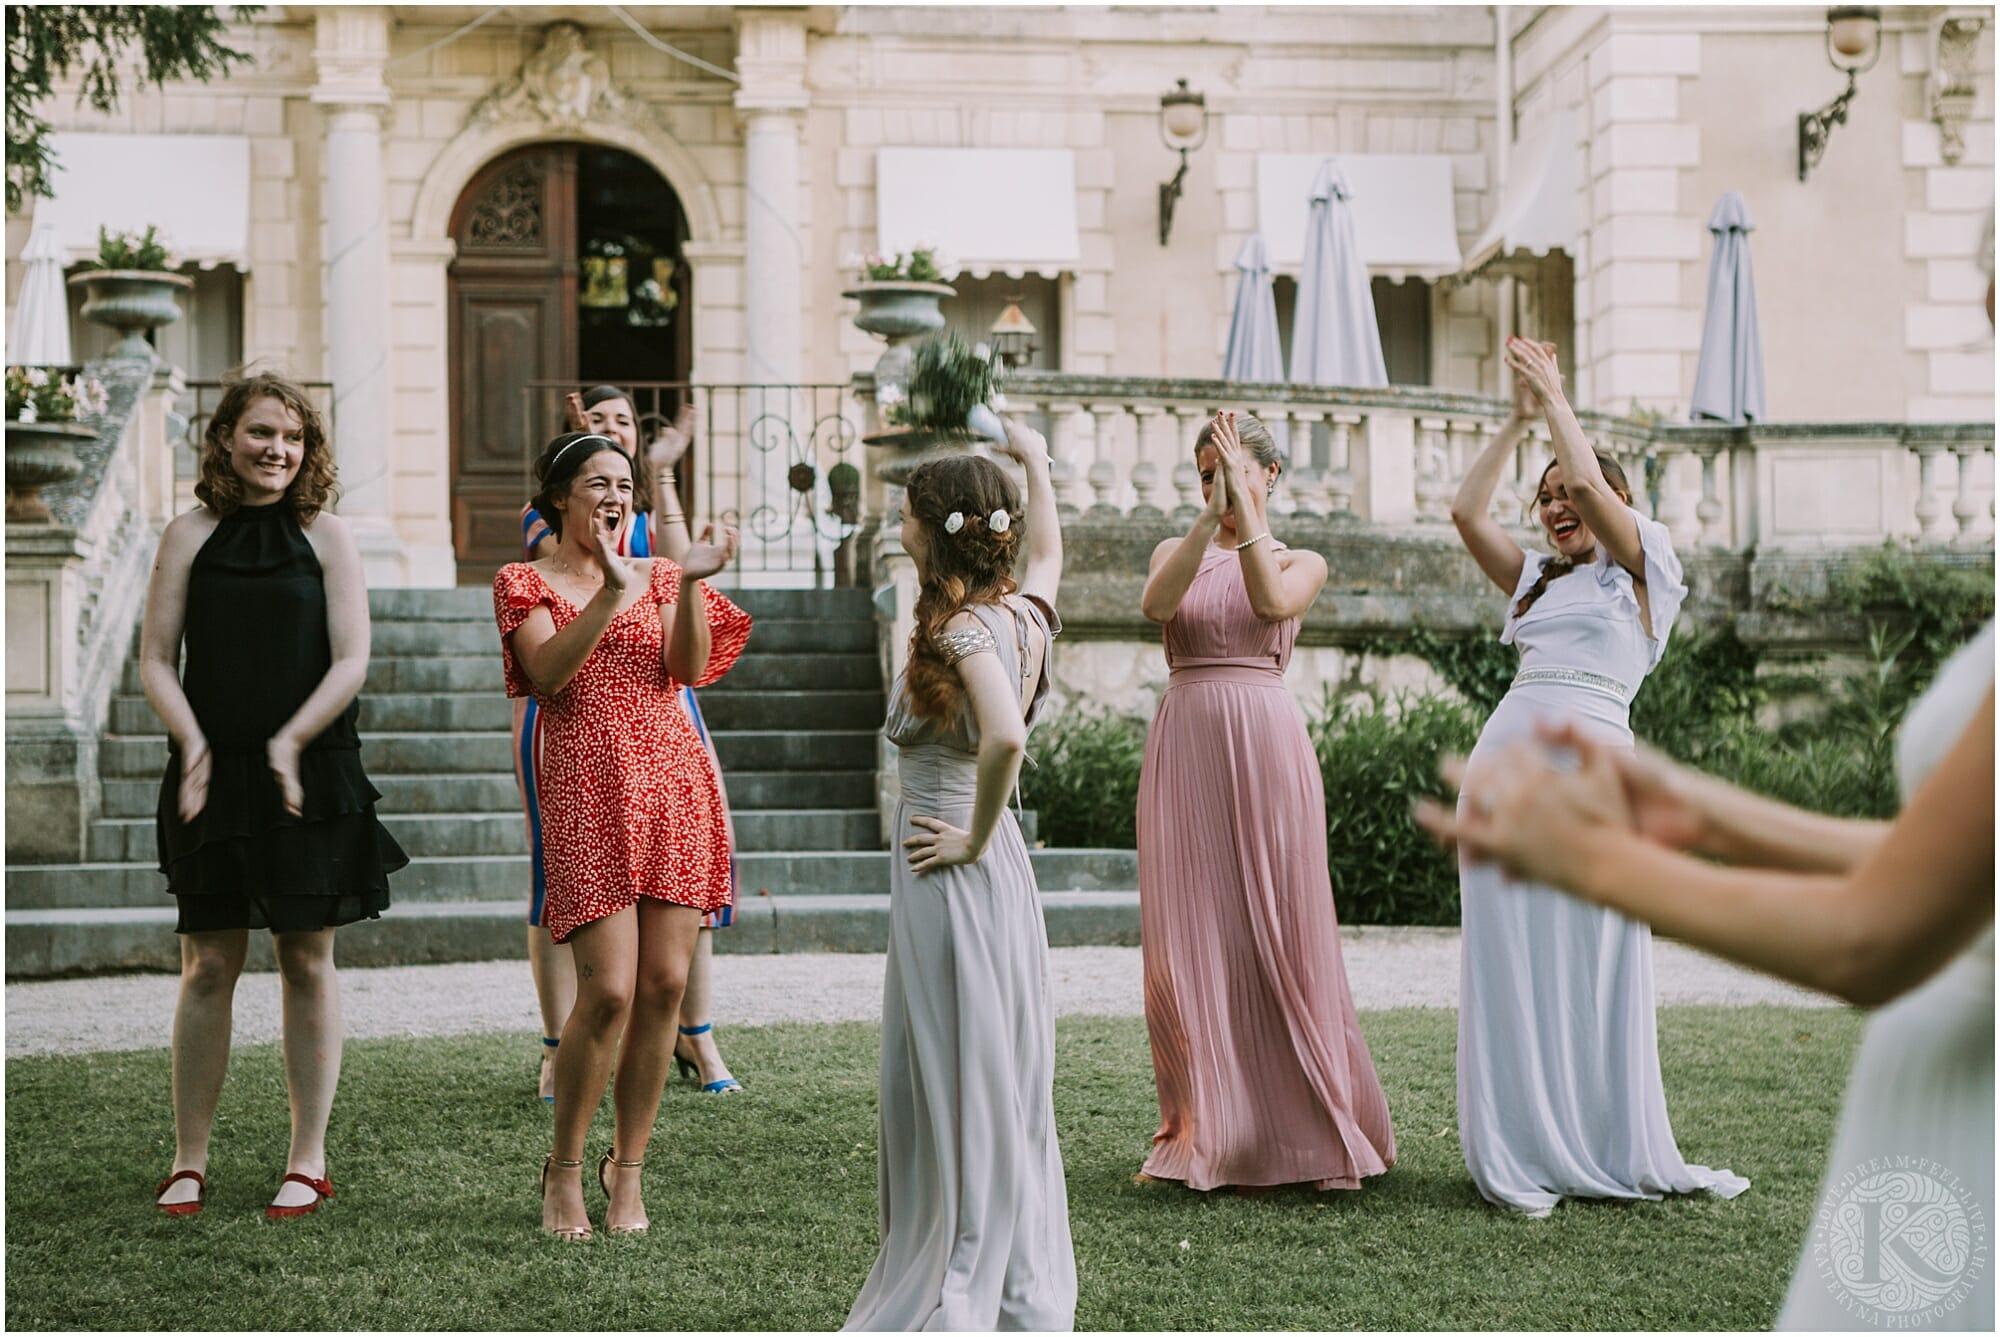 Kateryna-photos-photographe-mariage-chateau-des-3-fontaines-provence-avignon-vaucluse-sud_0080.jpg